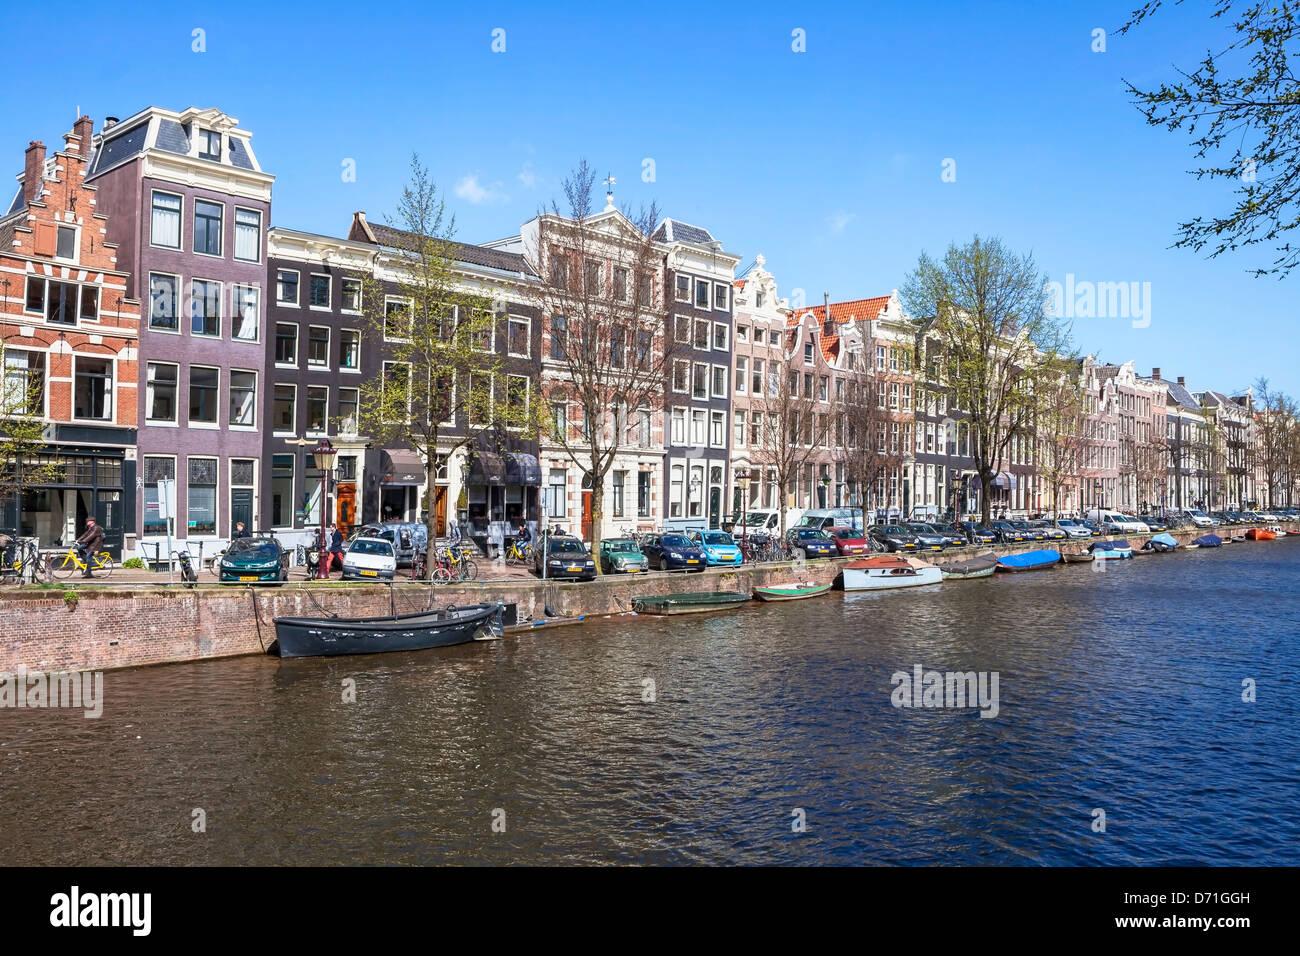 Amsterdam, Prinsengracht, North Holland, Netherlands Stock Photo